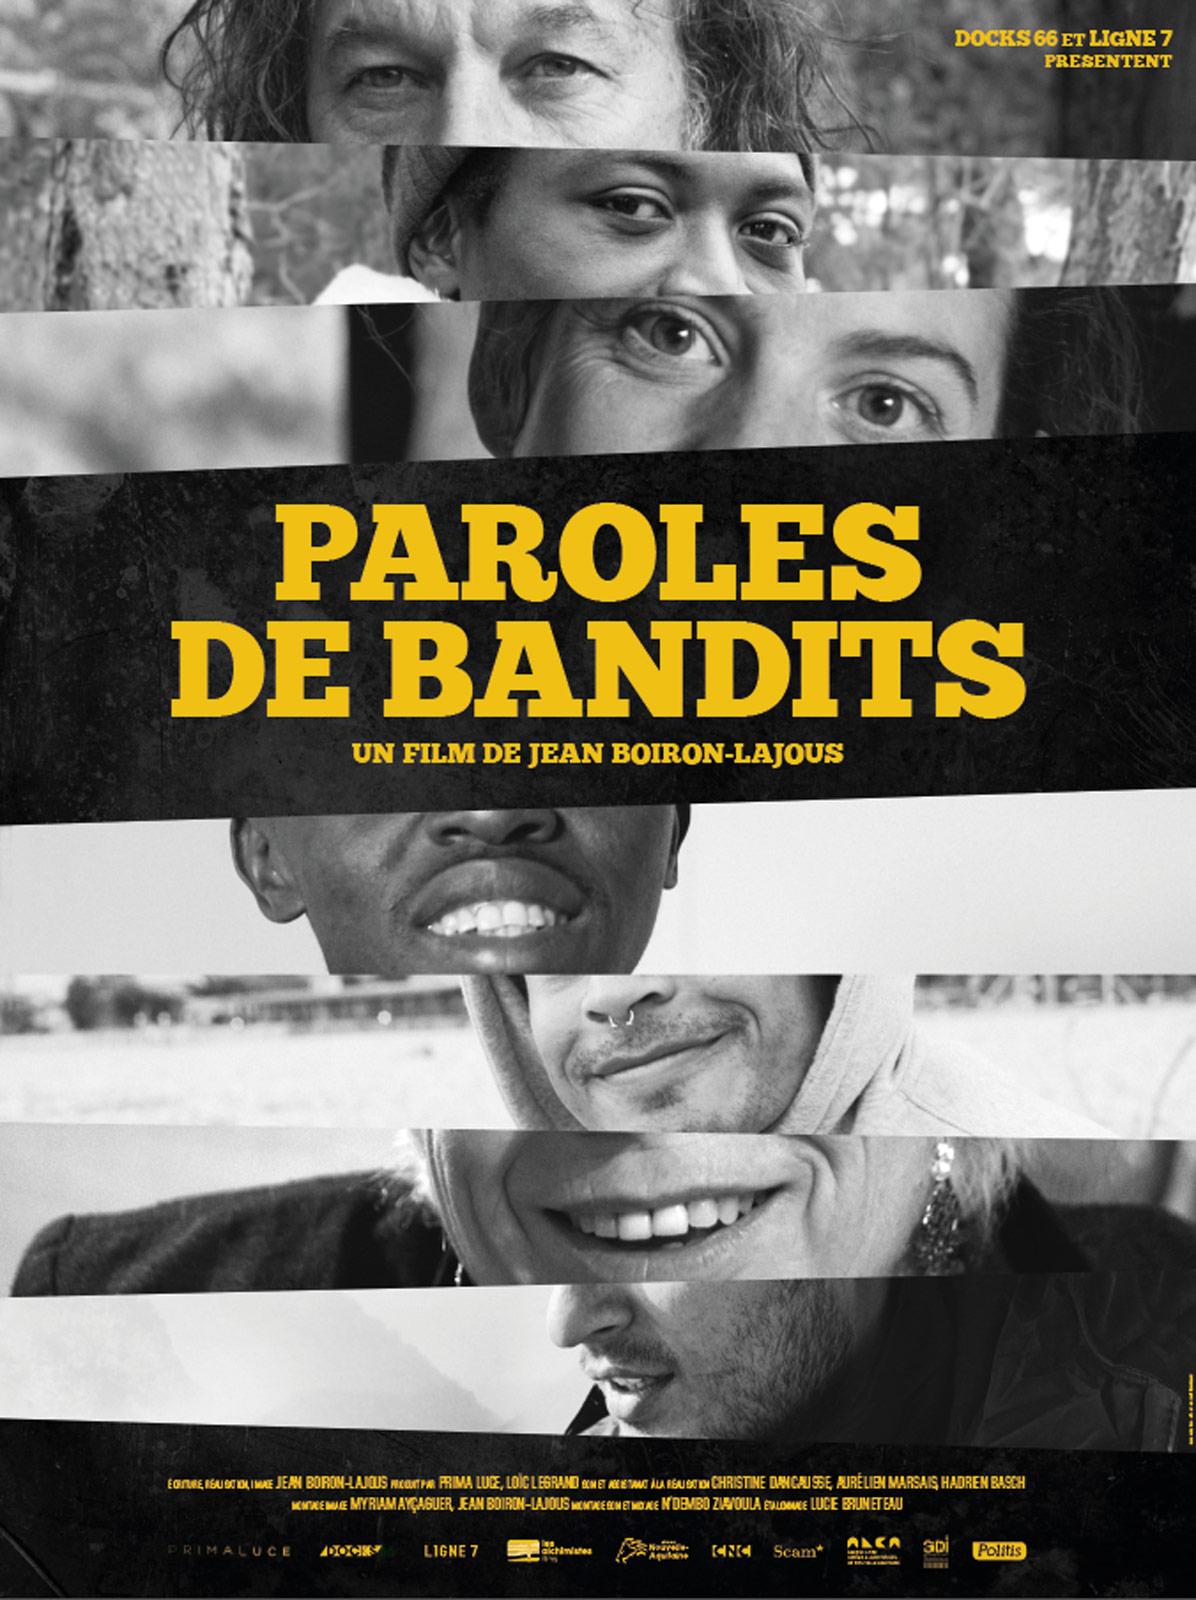 Image du film Paroles de bandits